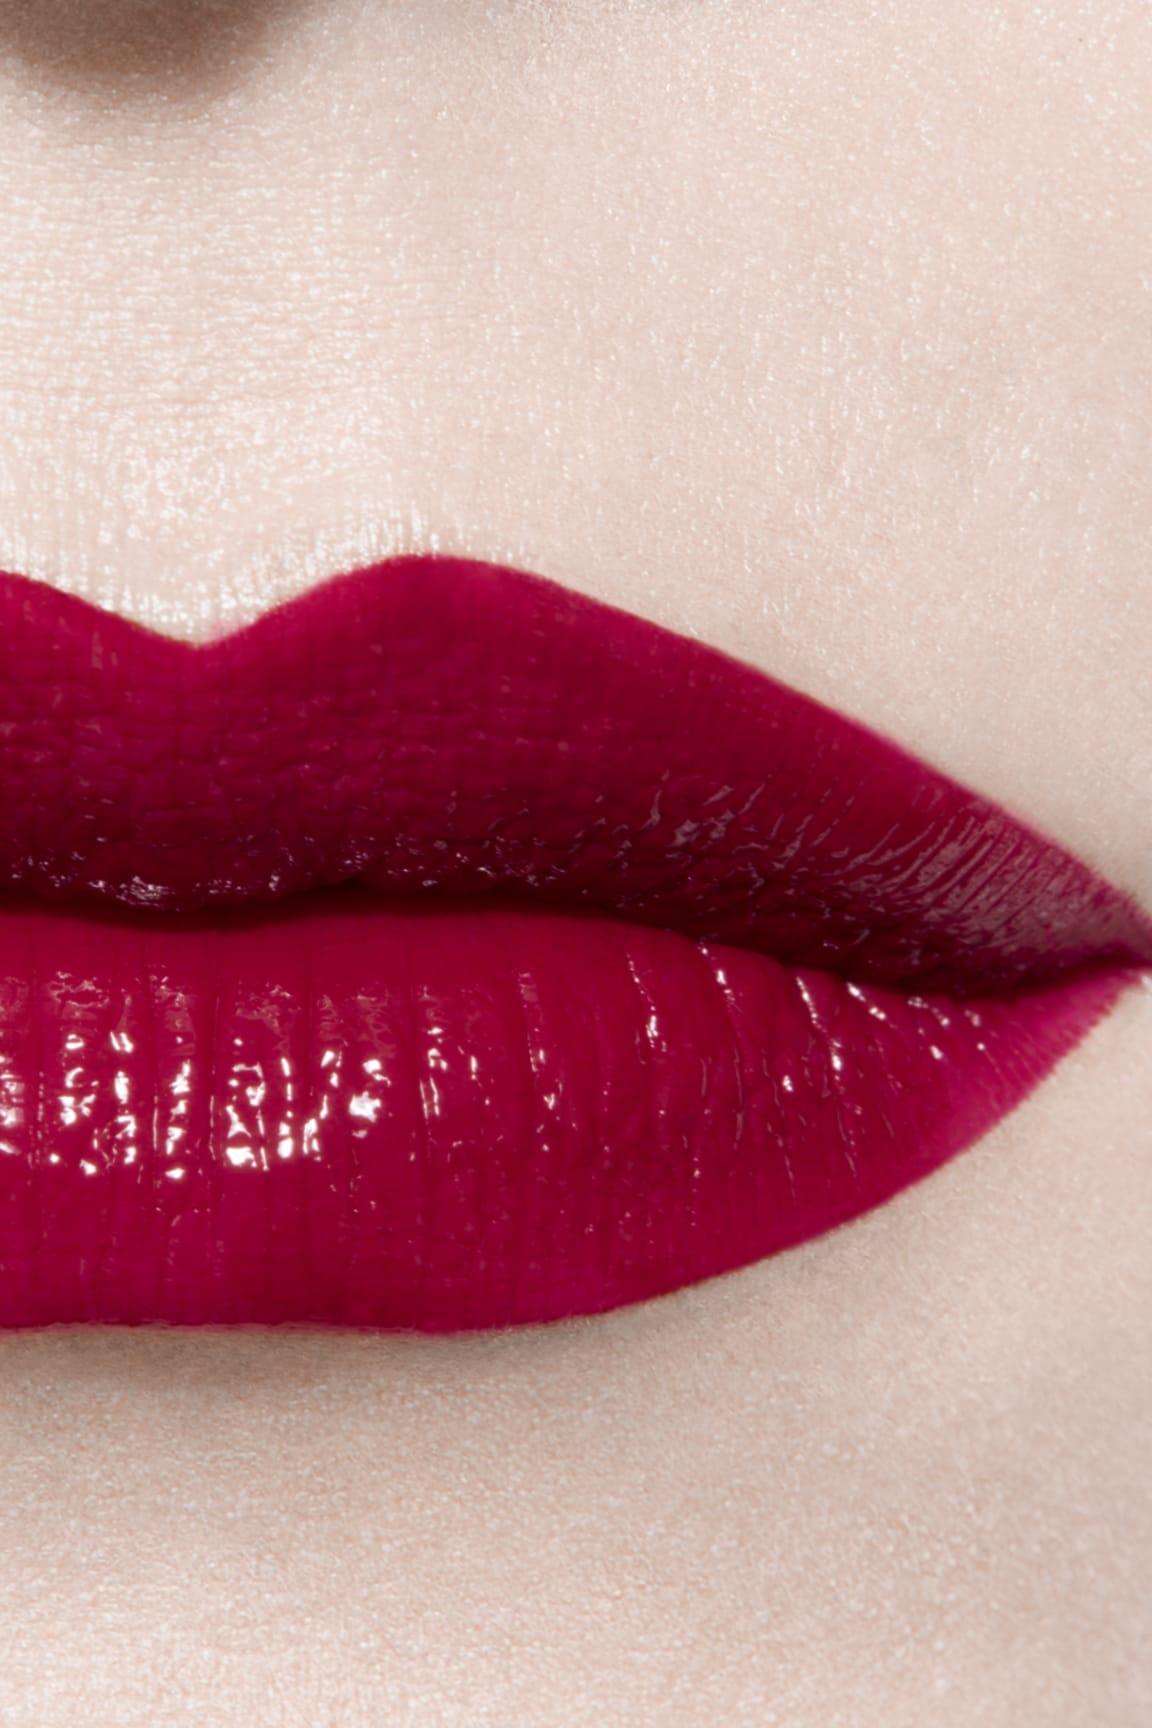 Imagen aplicación de maquillaje 3 - ROUGE ALLURE LAQUE 80 - TIMELESS